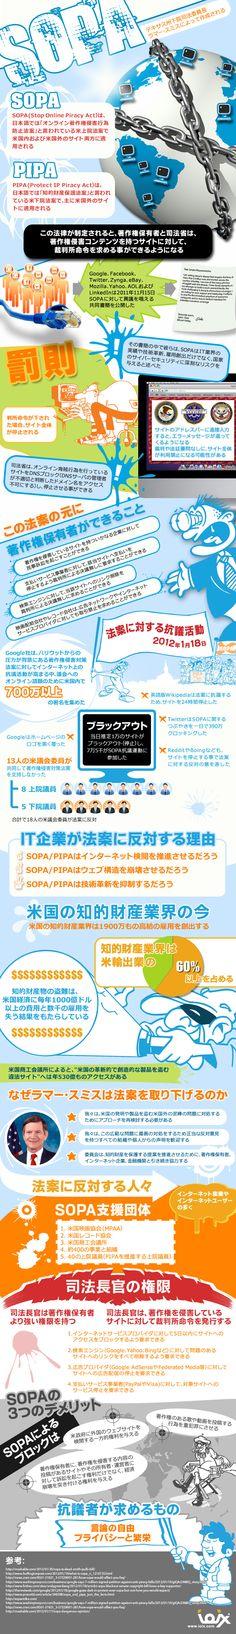 SOPA_600px